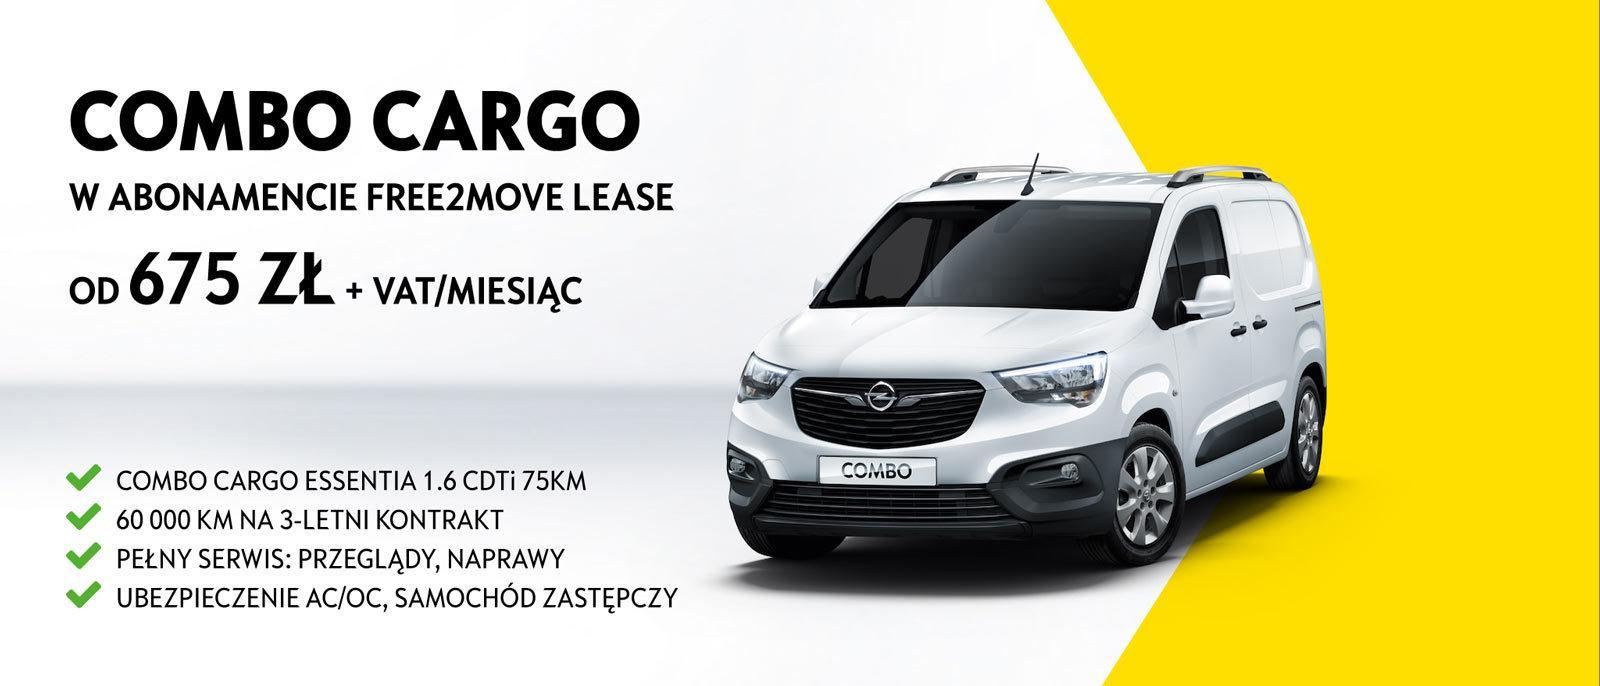 Opel Combo Cargo w abonamencie Free2Move Lease